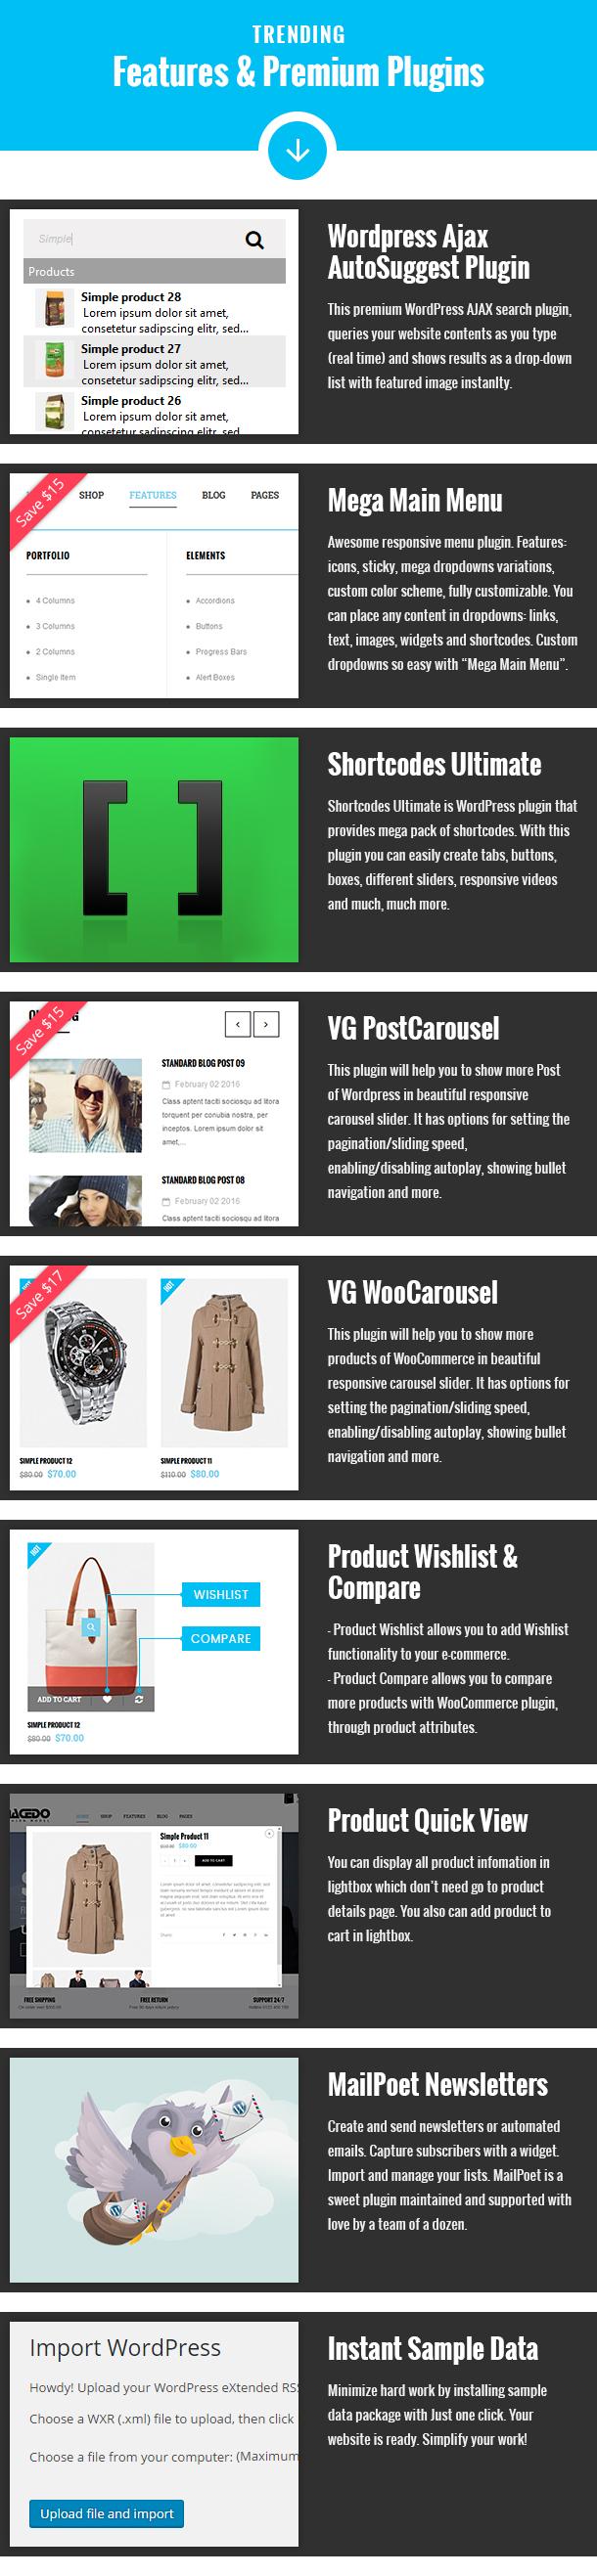 VG Macedo - Fashion Responsive WordPress Theme - 18